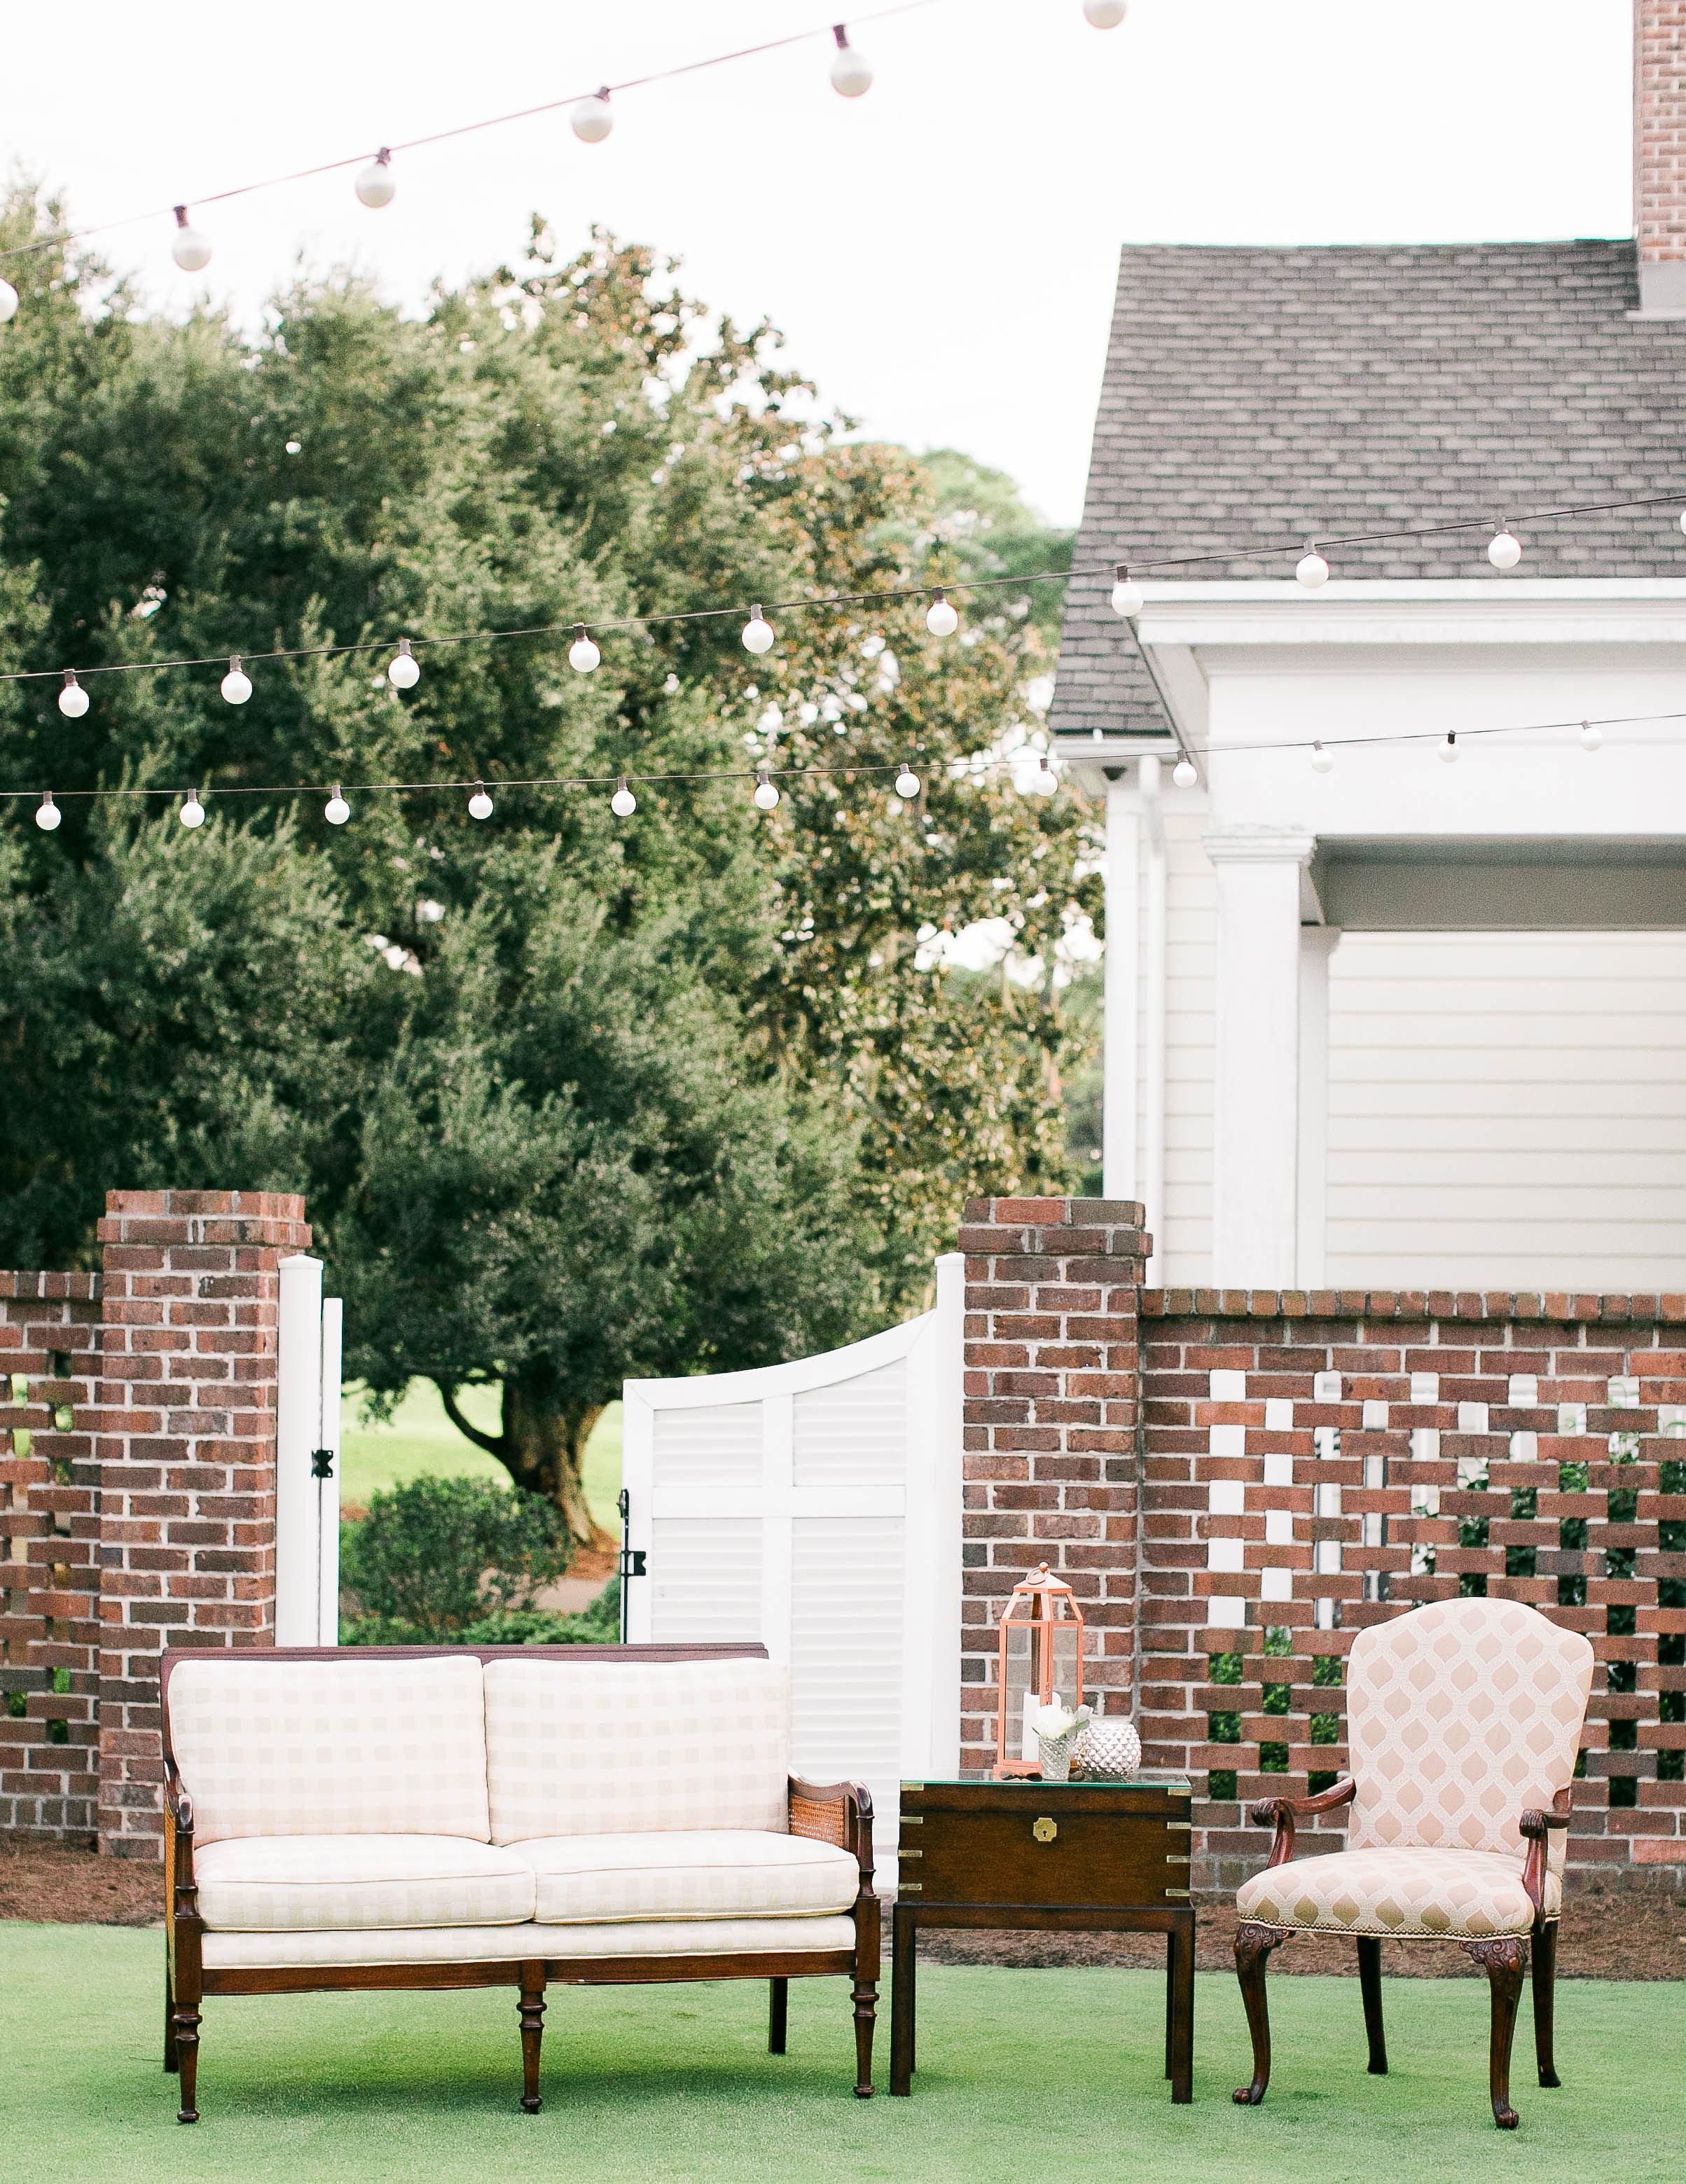 Outdoor lounge furniture at Savannah Golf Club wedding